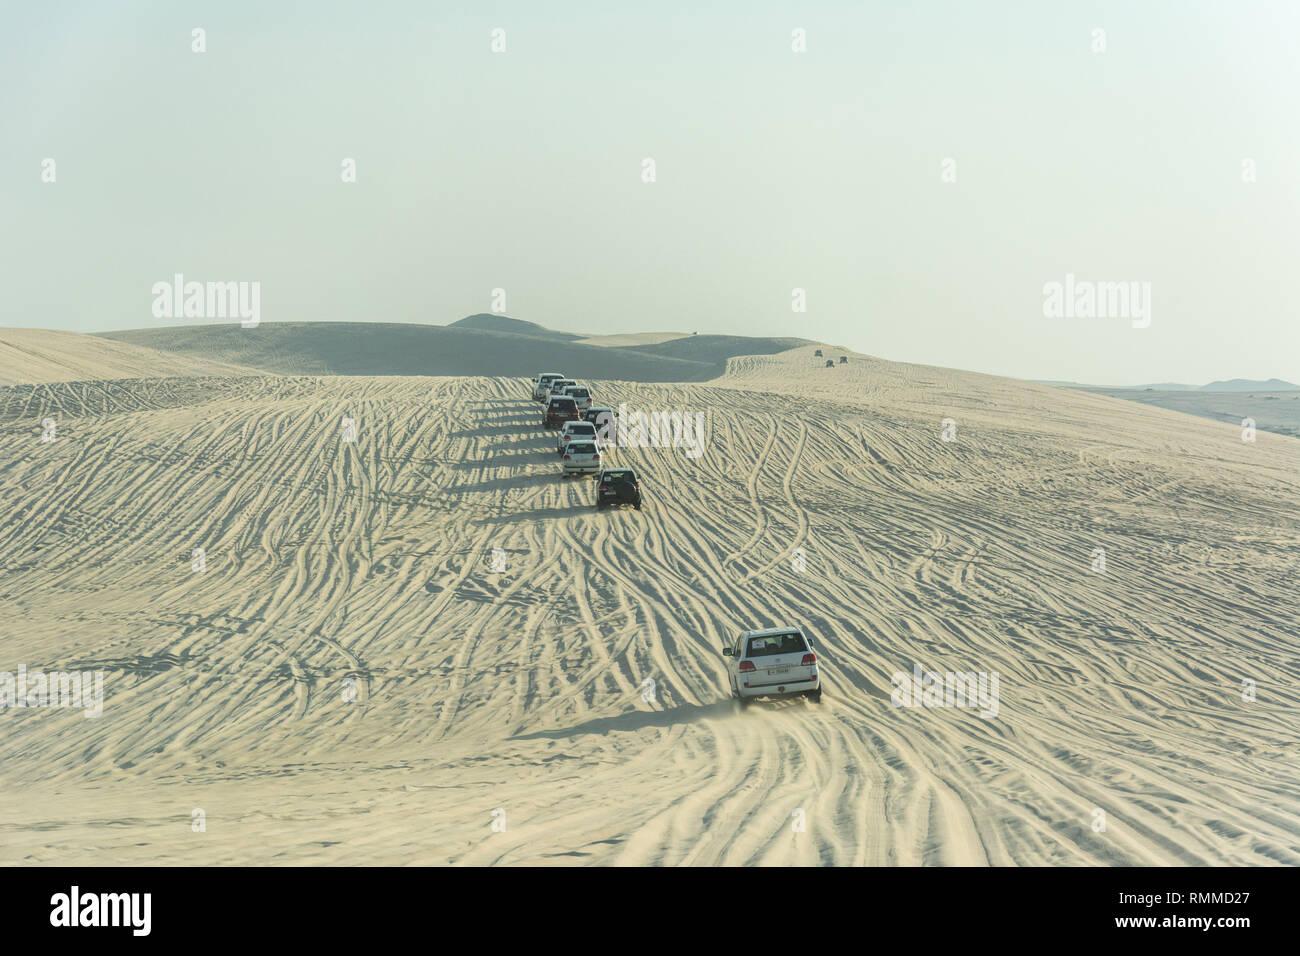 Khor Al Adaid, Qatar - November 5, 2016. 4WD vehicles driving on sand dunes in Khor Al Adaid desert in Qatar. - Stock Image